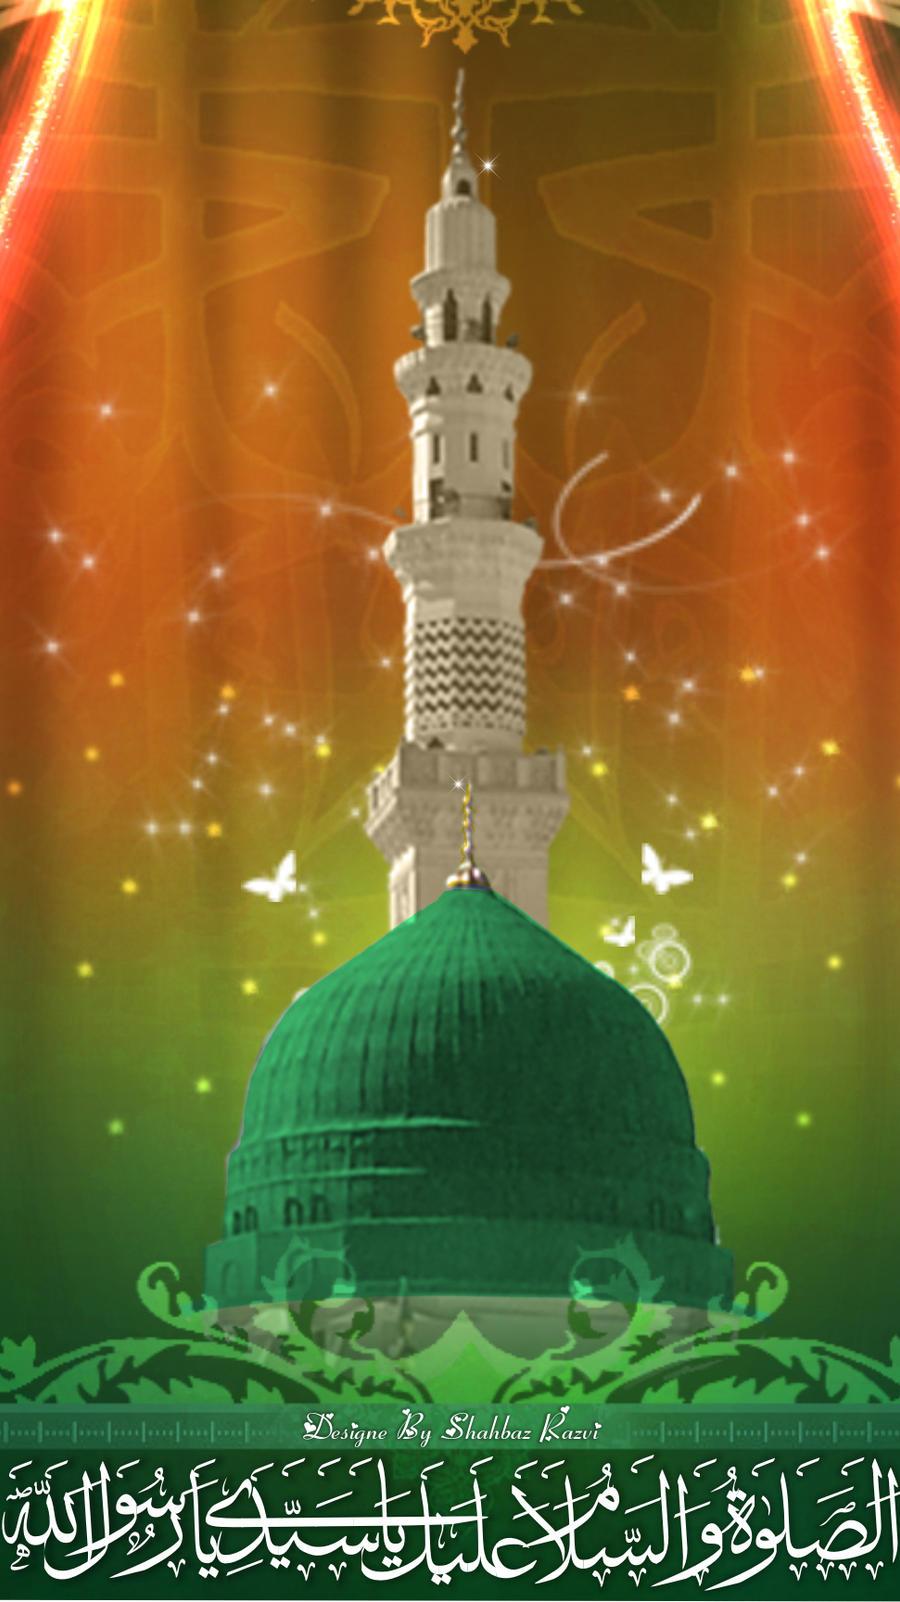 Hedendaags Islamic Wallpaper HD by SHAHBAZRAZVI on DeviantArt KS-36